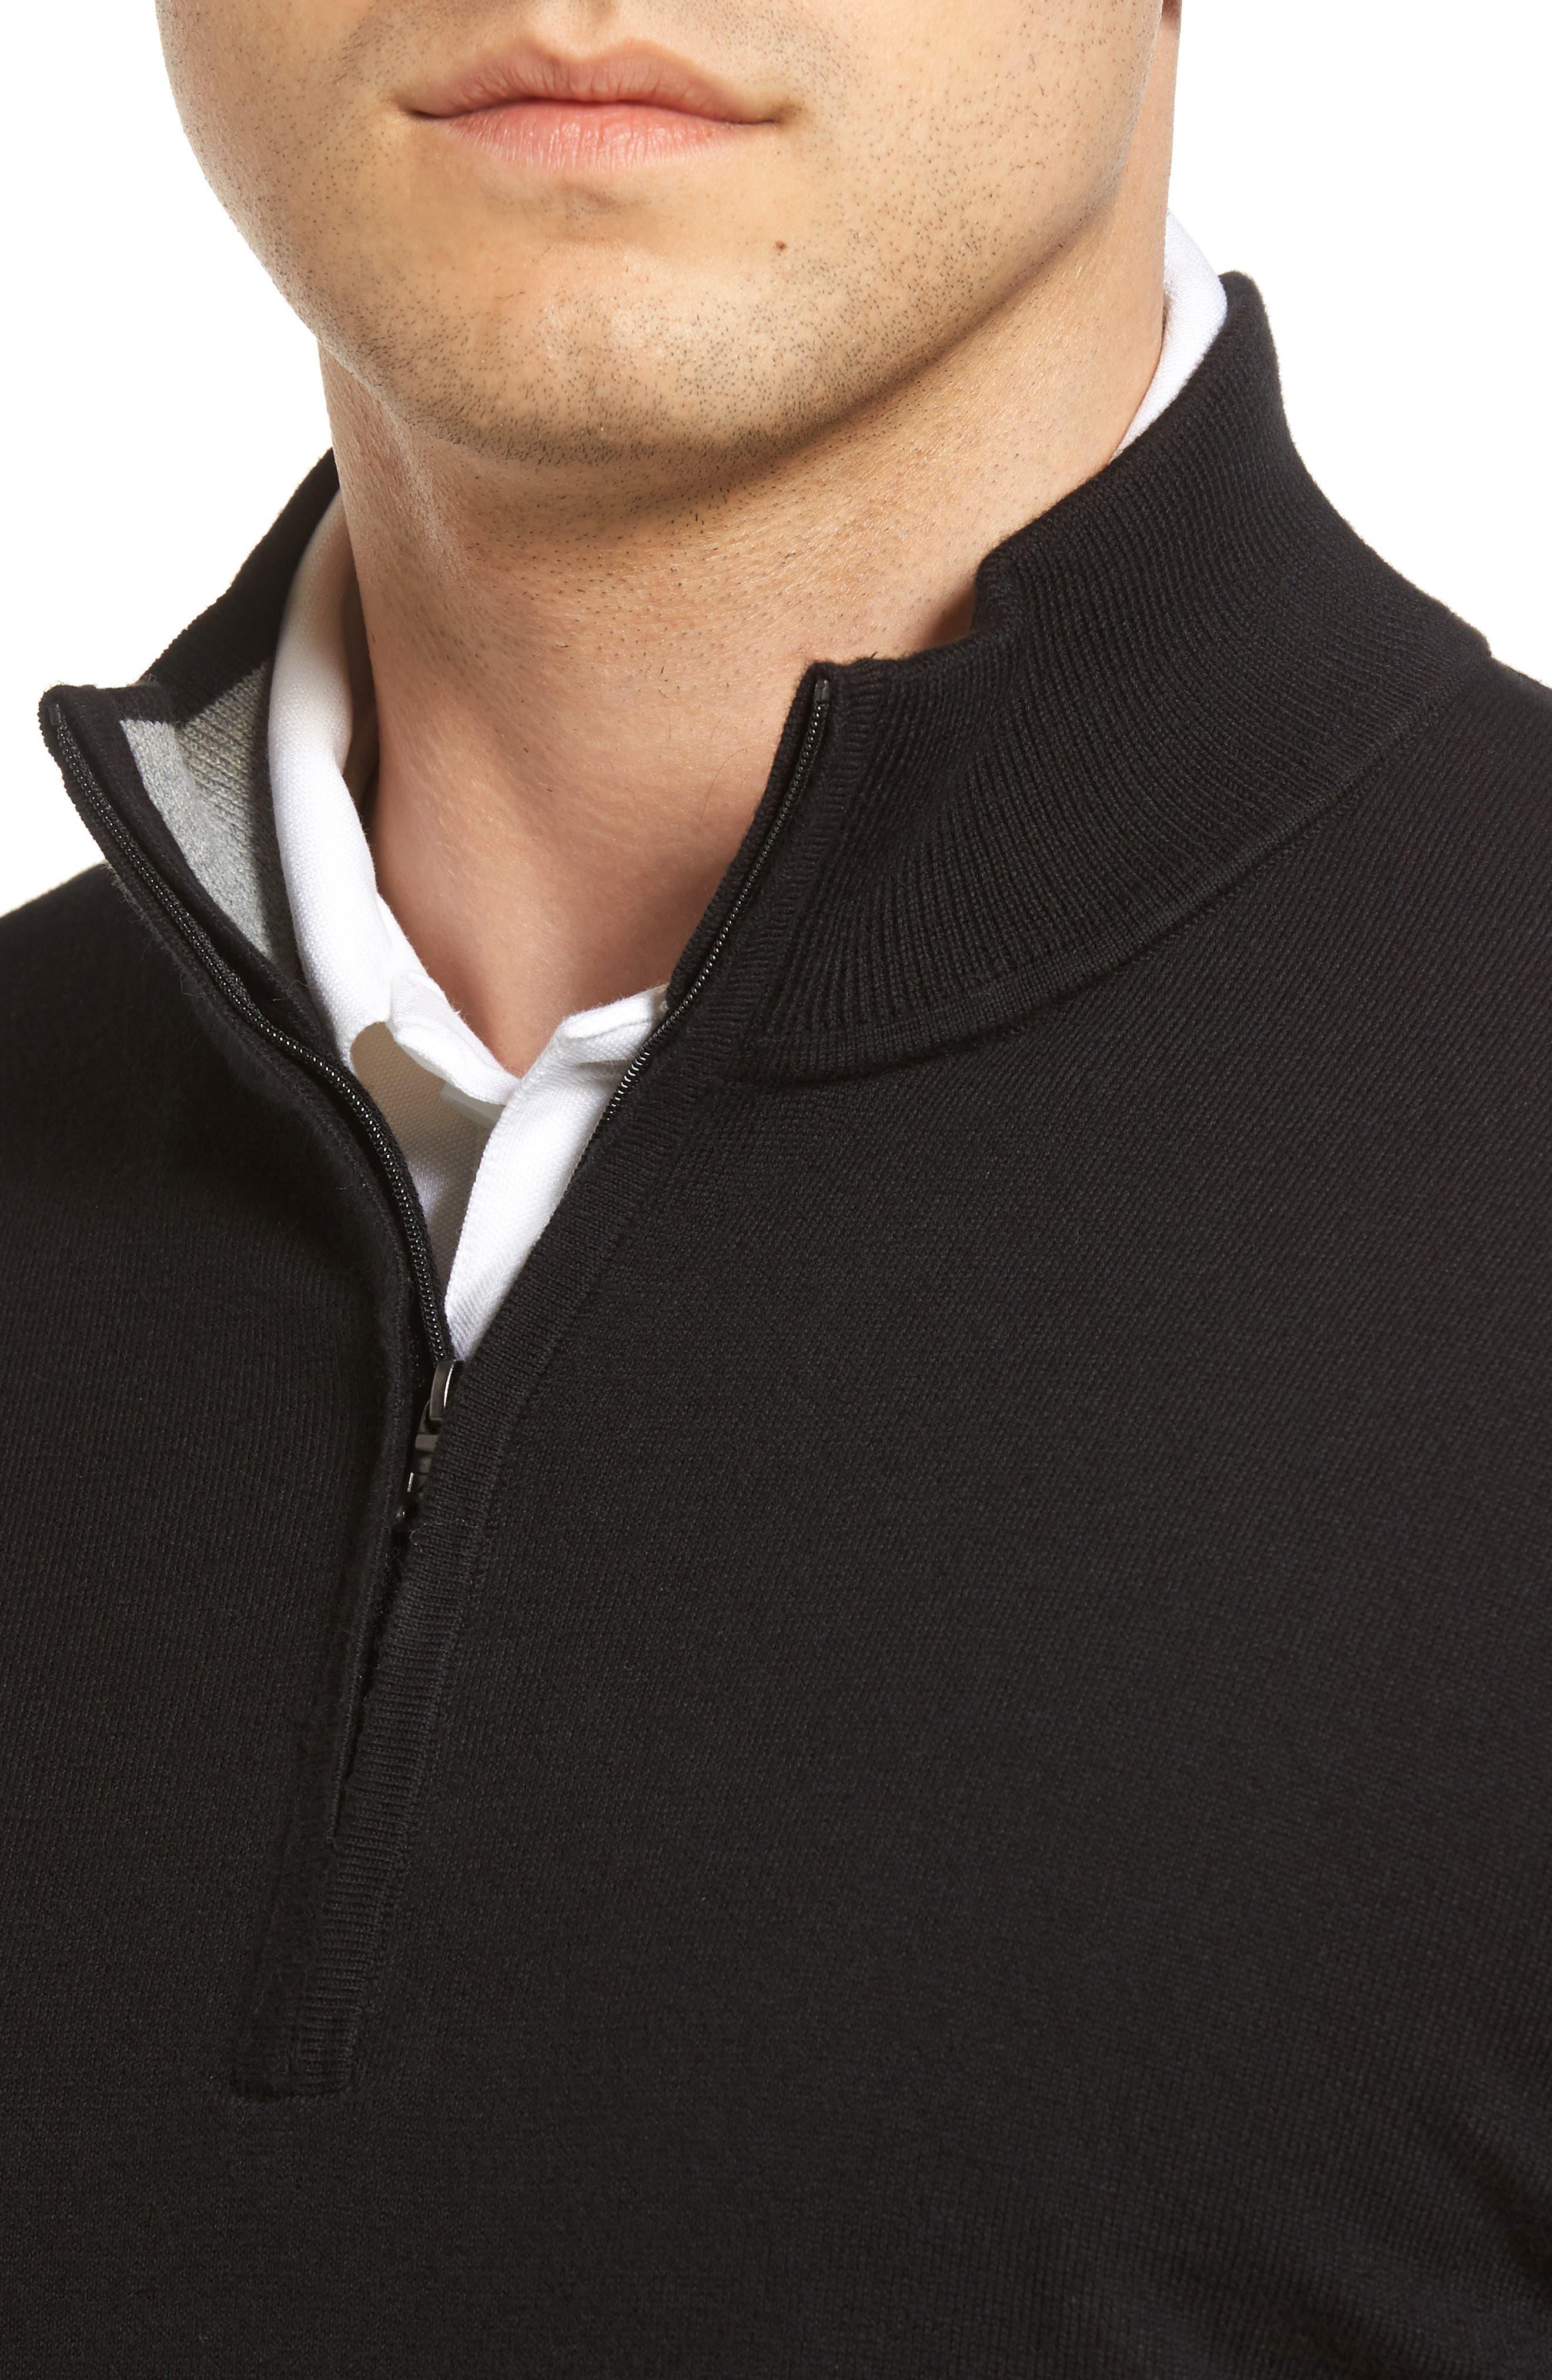 Lakemont Half Zip Sweater,                             Alternate thumbnail 4, color,                             BLACK